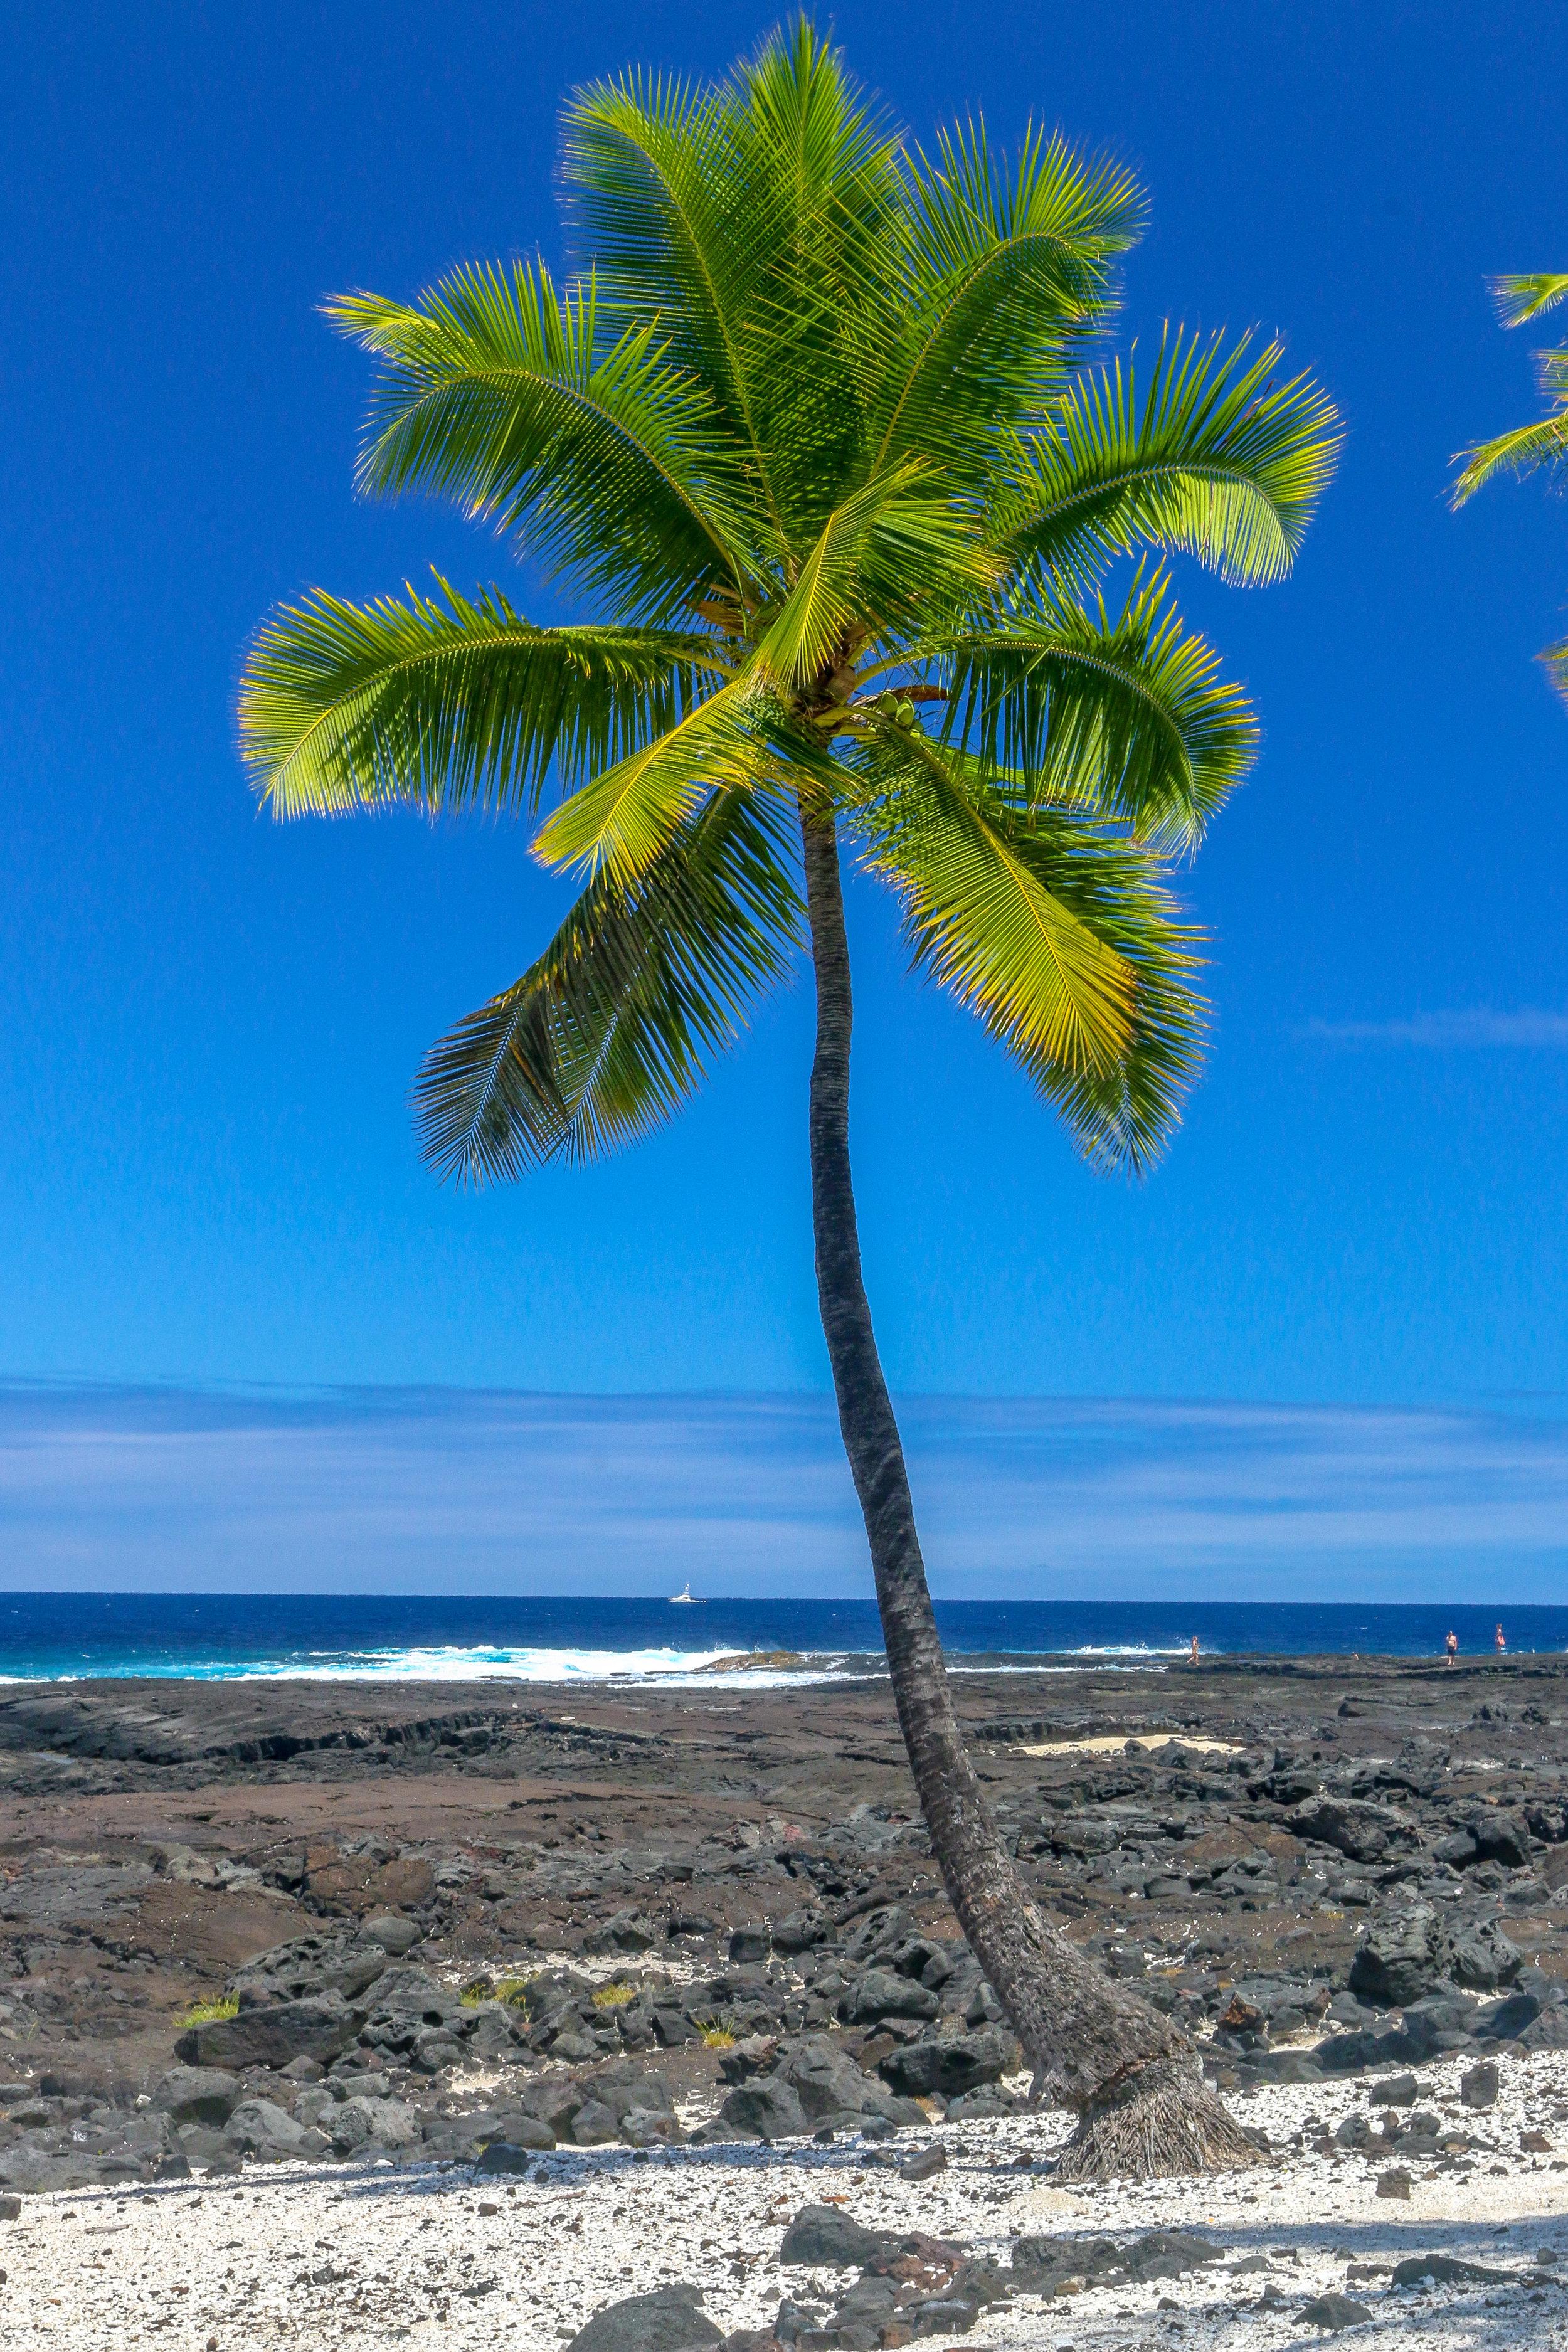 Hawaii HI Big Island Photos Photography perfect palm tree